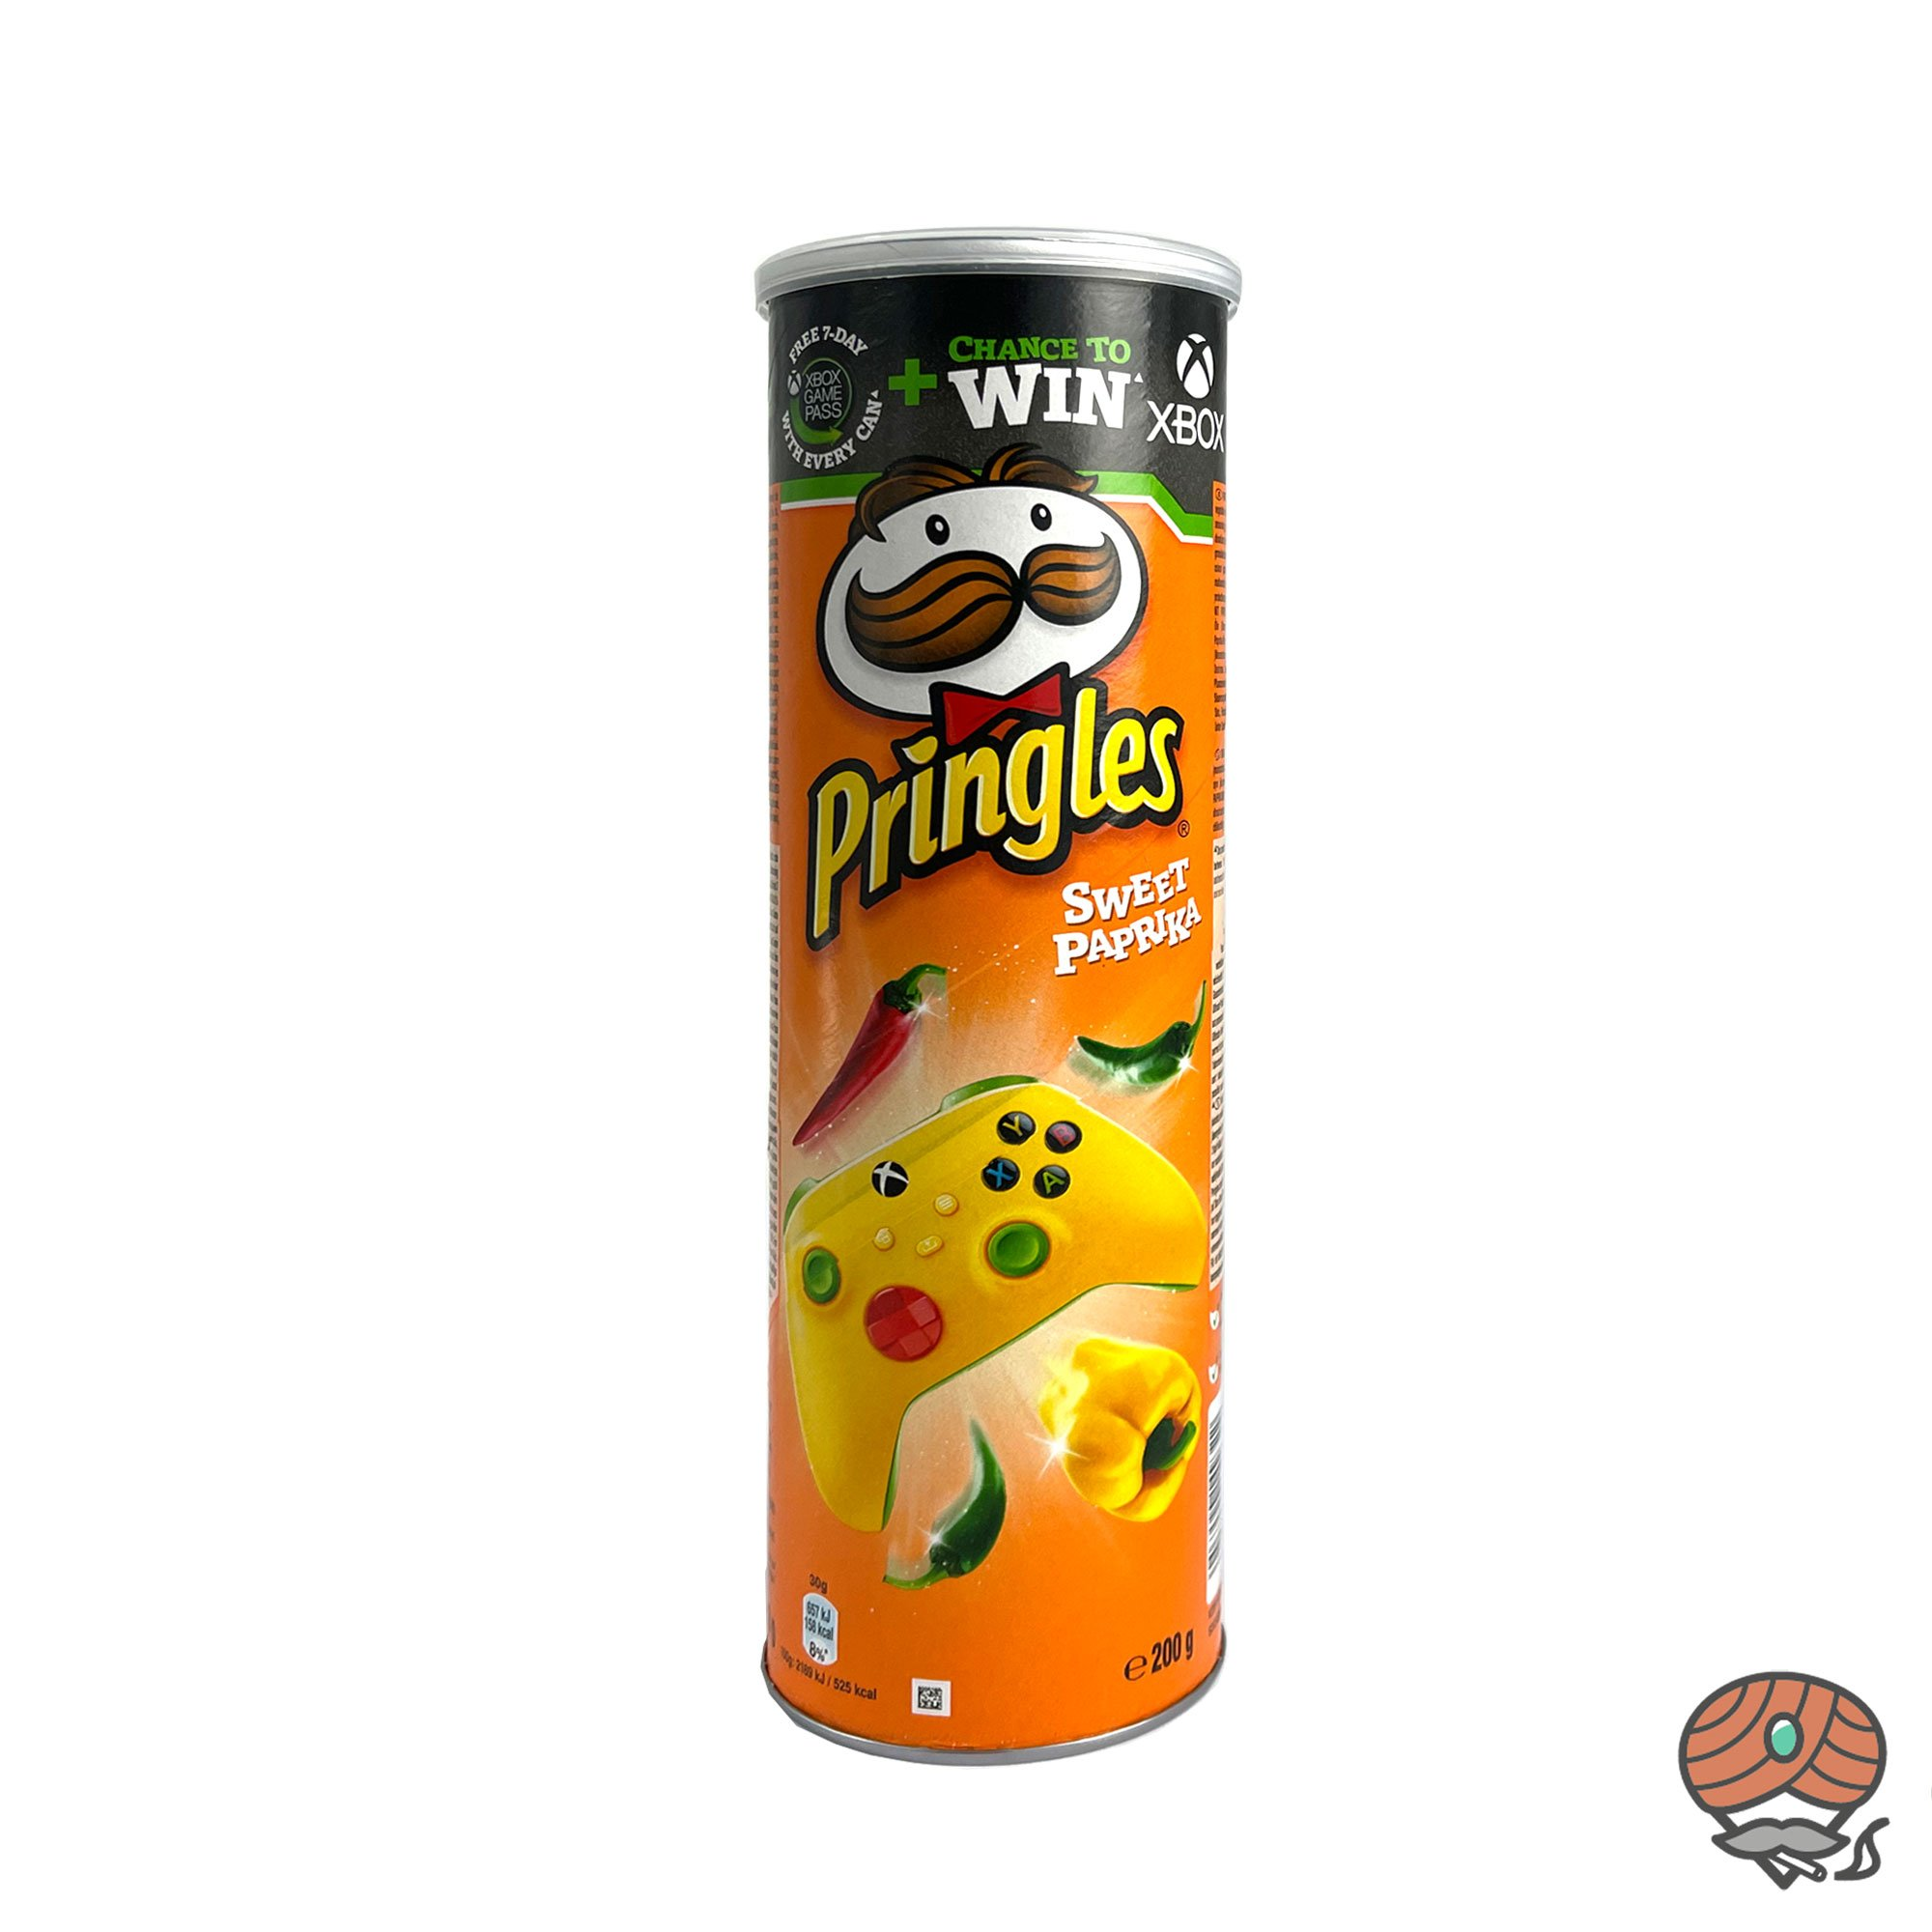 Pringles Sweet Paprika 200g Dose